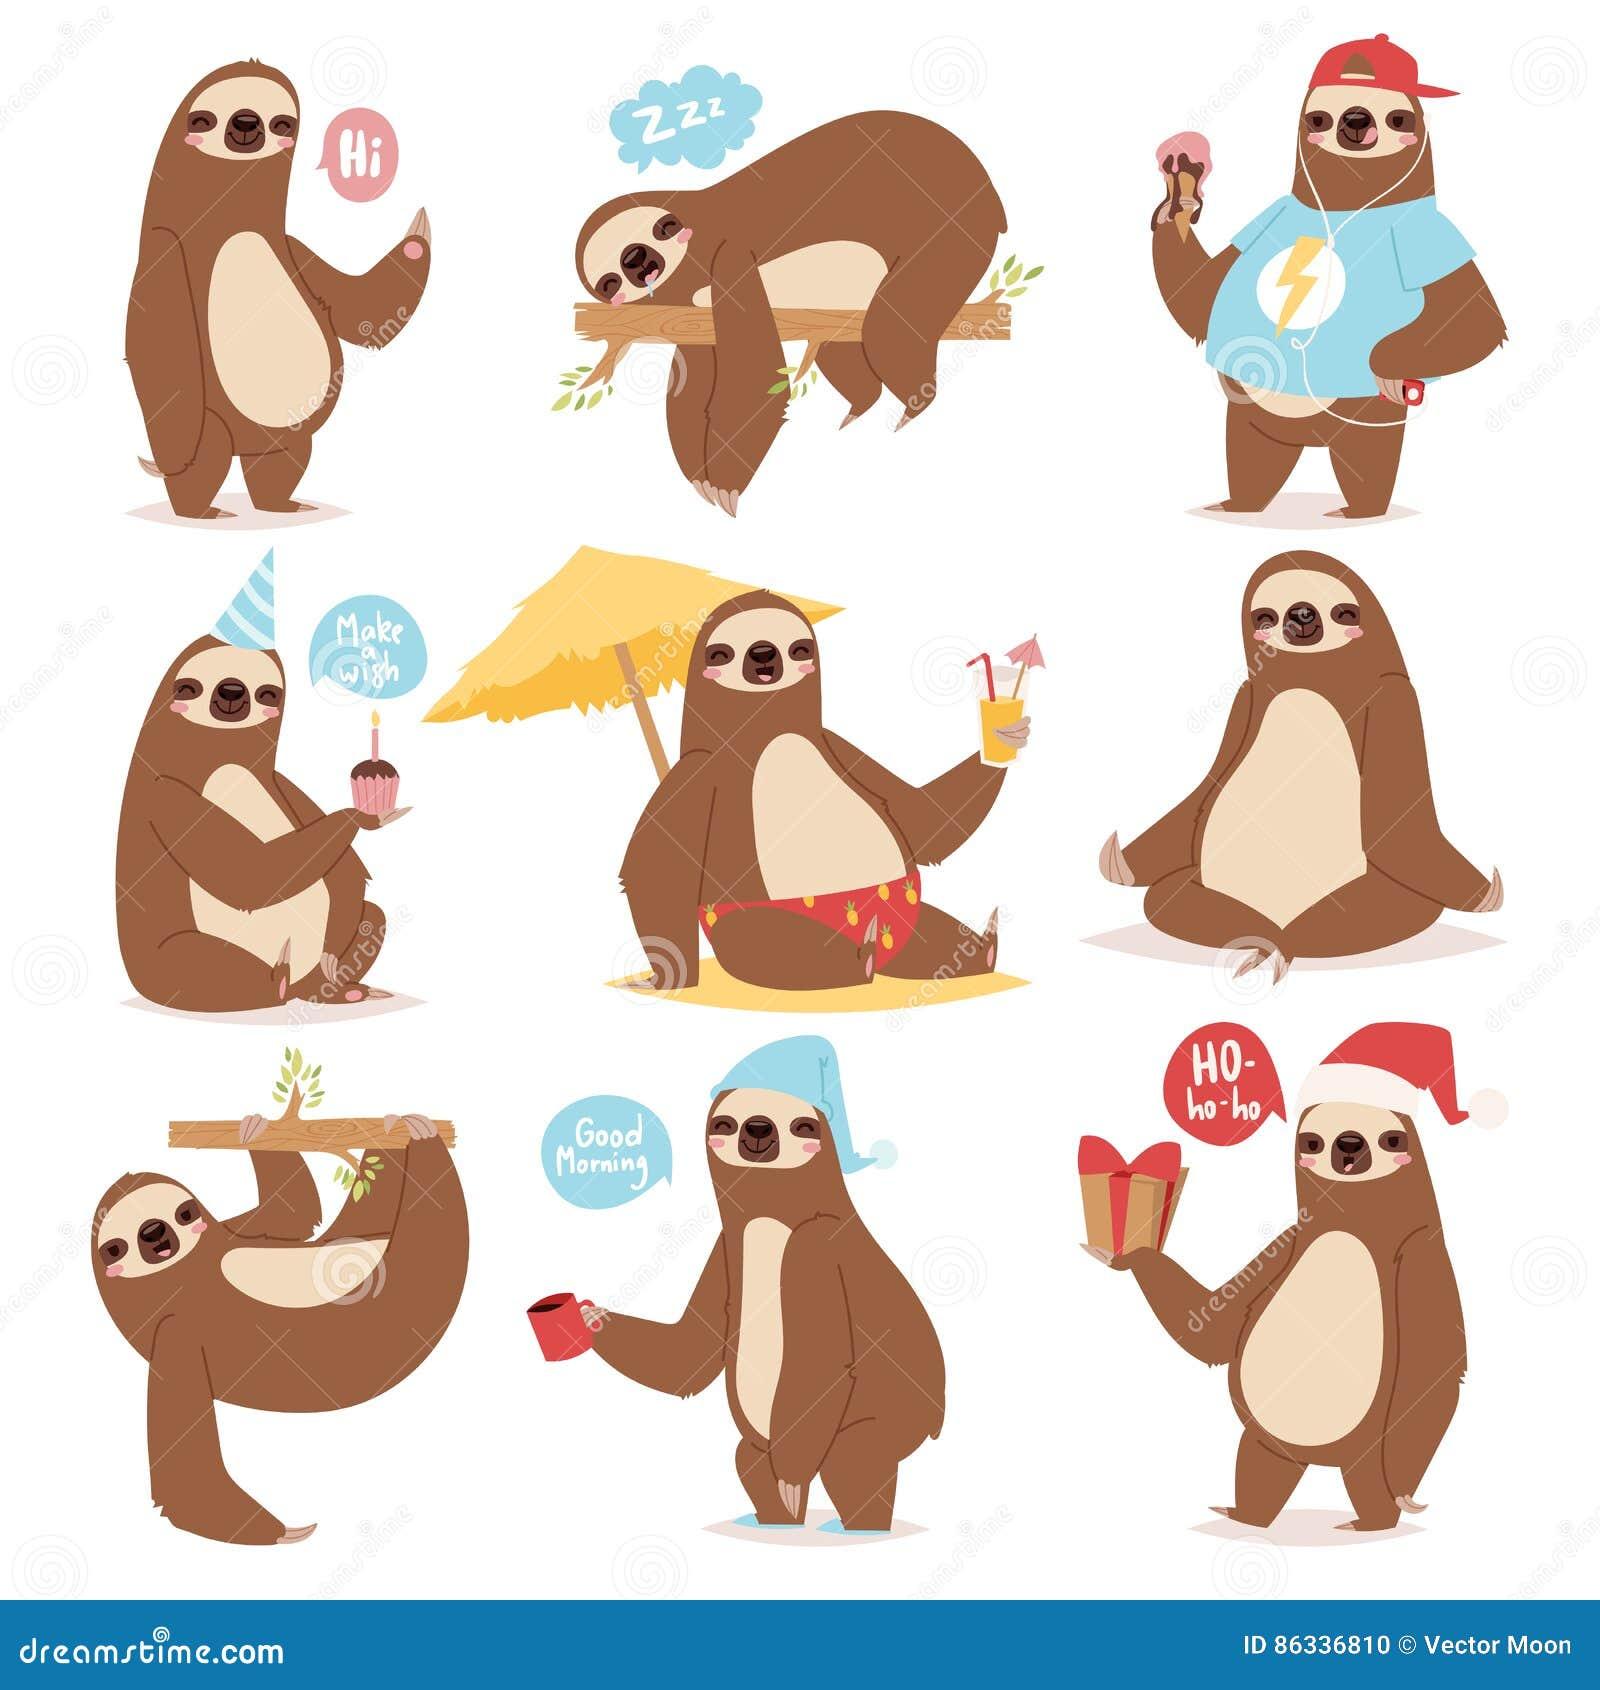 Laziness sloth animal character different pose like human cute lazy cartoon kawaii and slow down wild jungle mammal flat